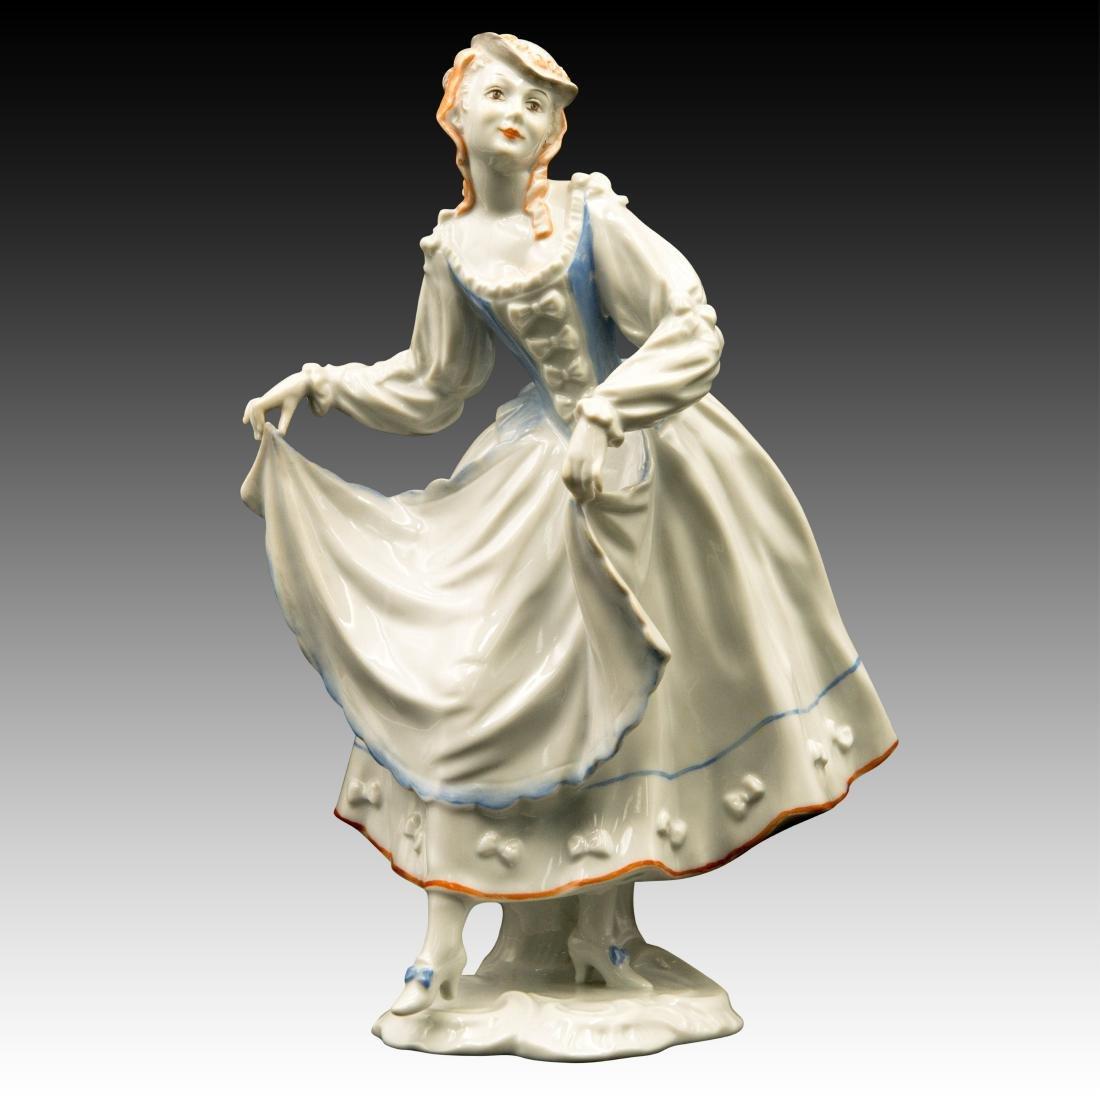 Rosenthal Rococo Lady Dancer Figurine